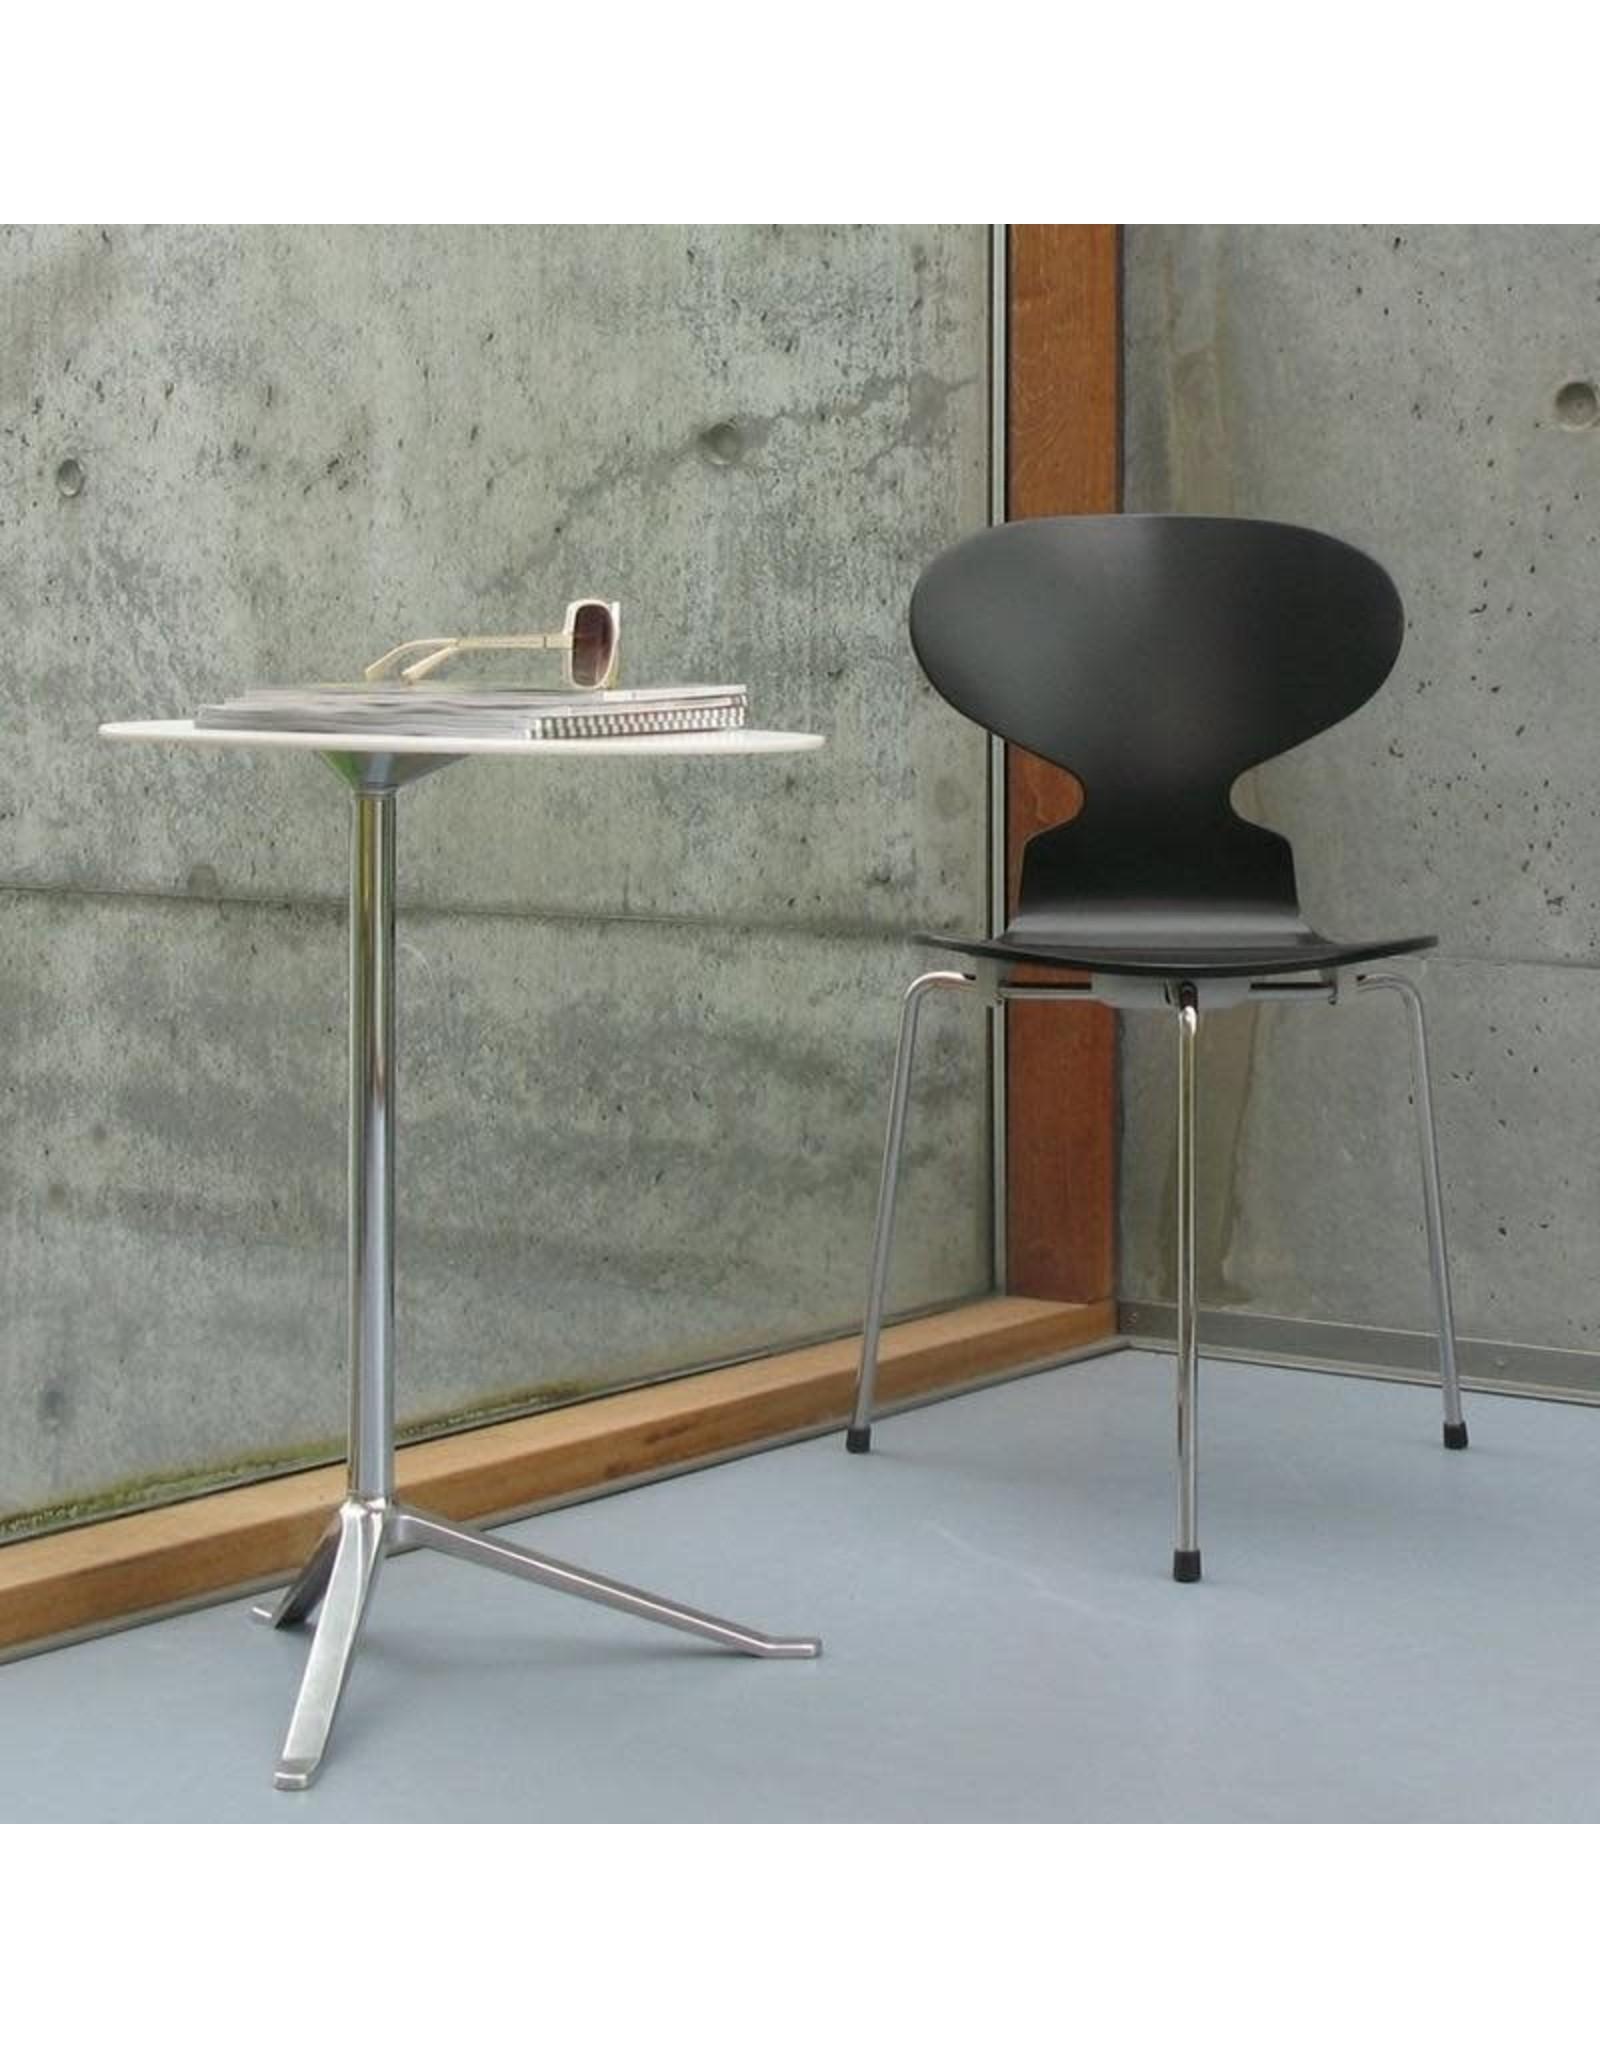 FRITZ HANSEN 3100 ANT 黑色岑木餐椅/螞蟻椅